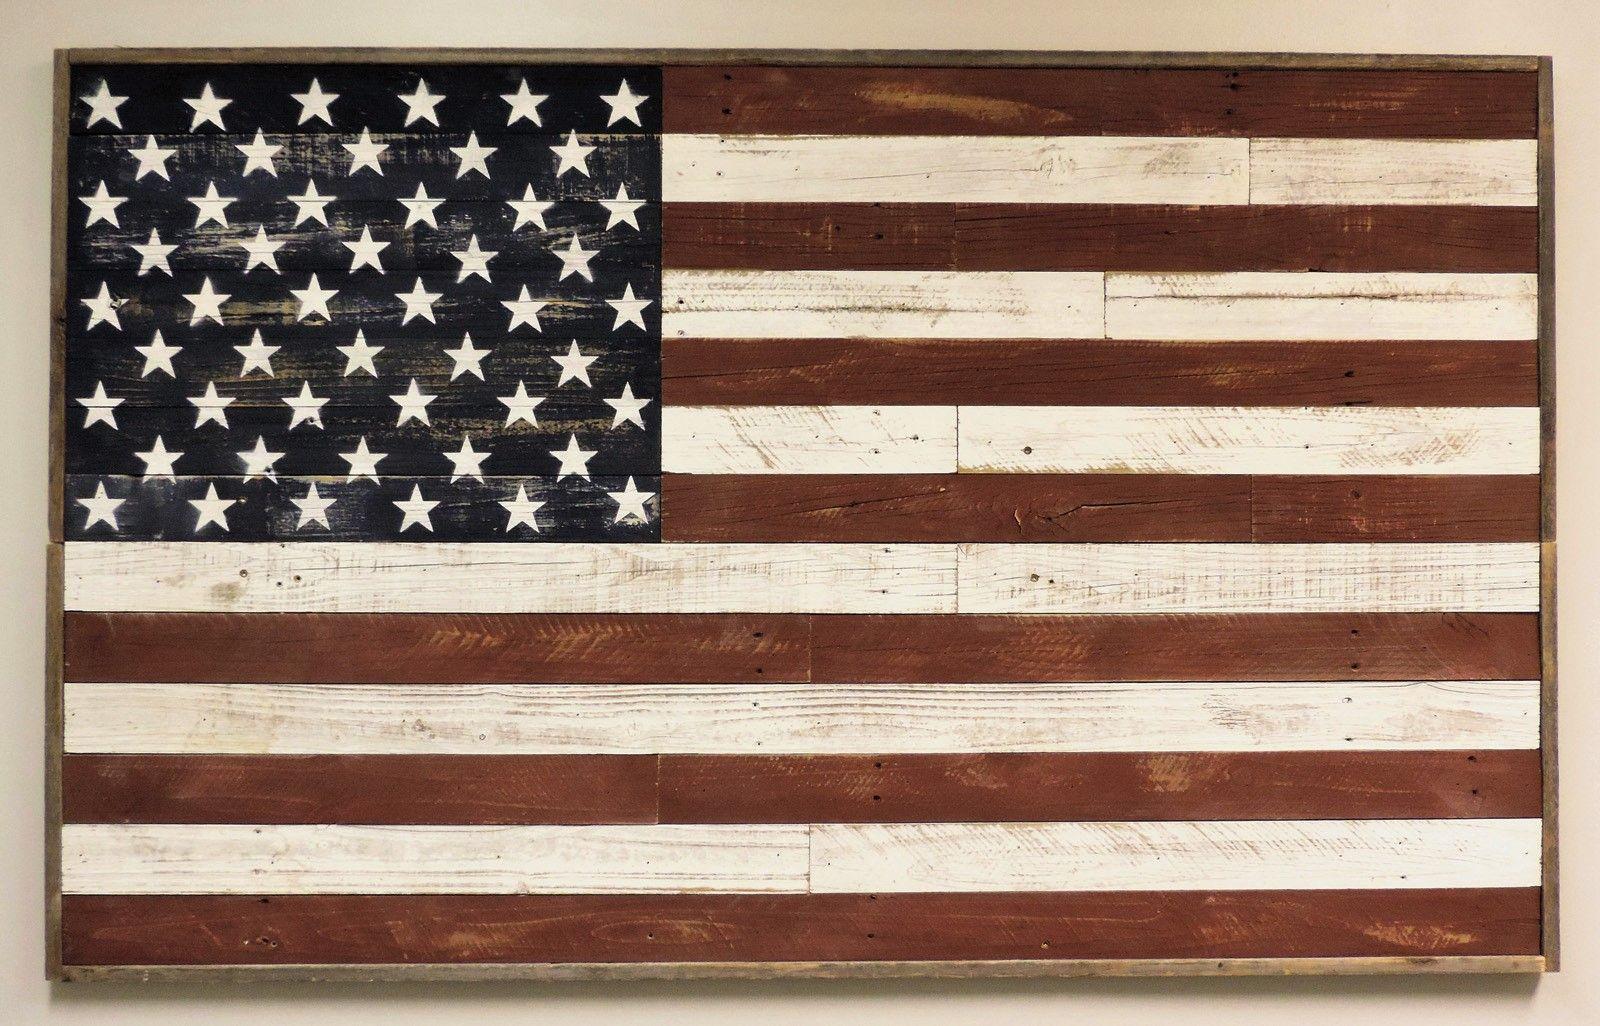 Full Size Barnwood American Flag Wall Art 3 X 5 Rustic Etsy American Flag Wall Art American Flag Wood Reclaimed Barn Wood